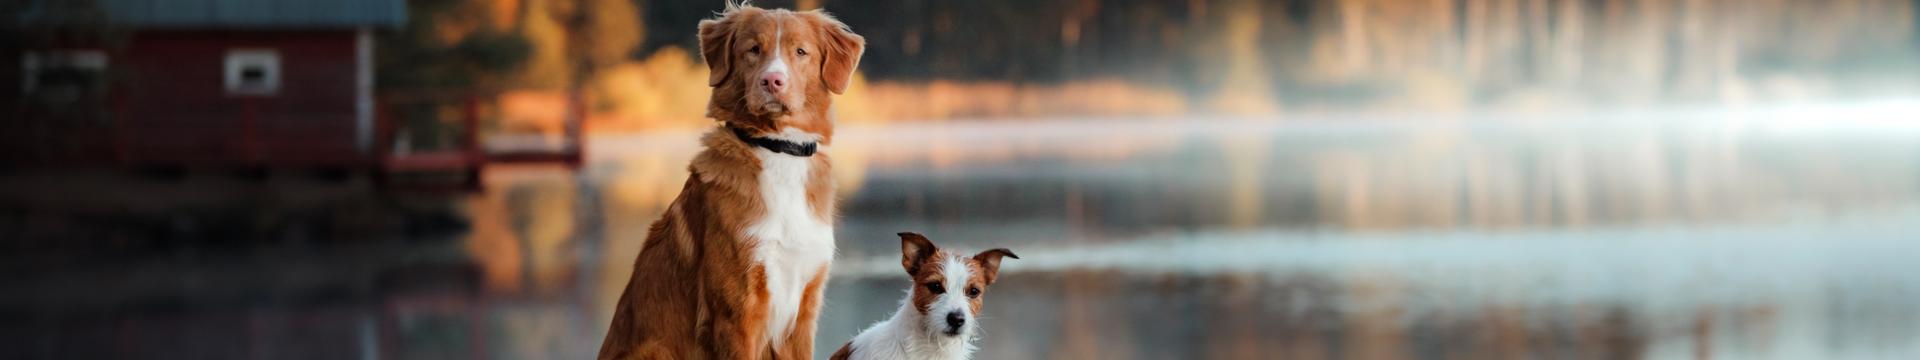 Is Westgate Mountain Smoky Resort pet friendly